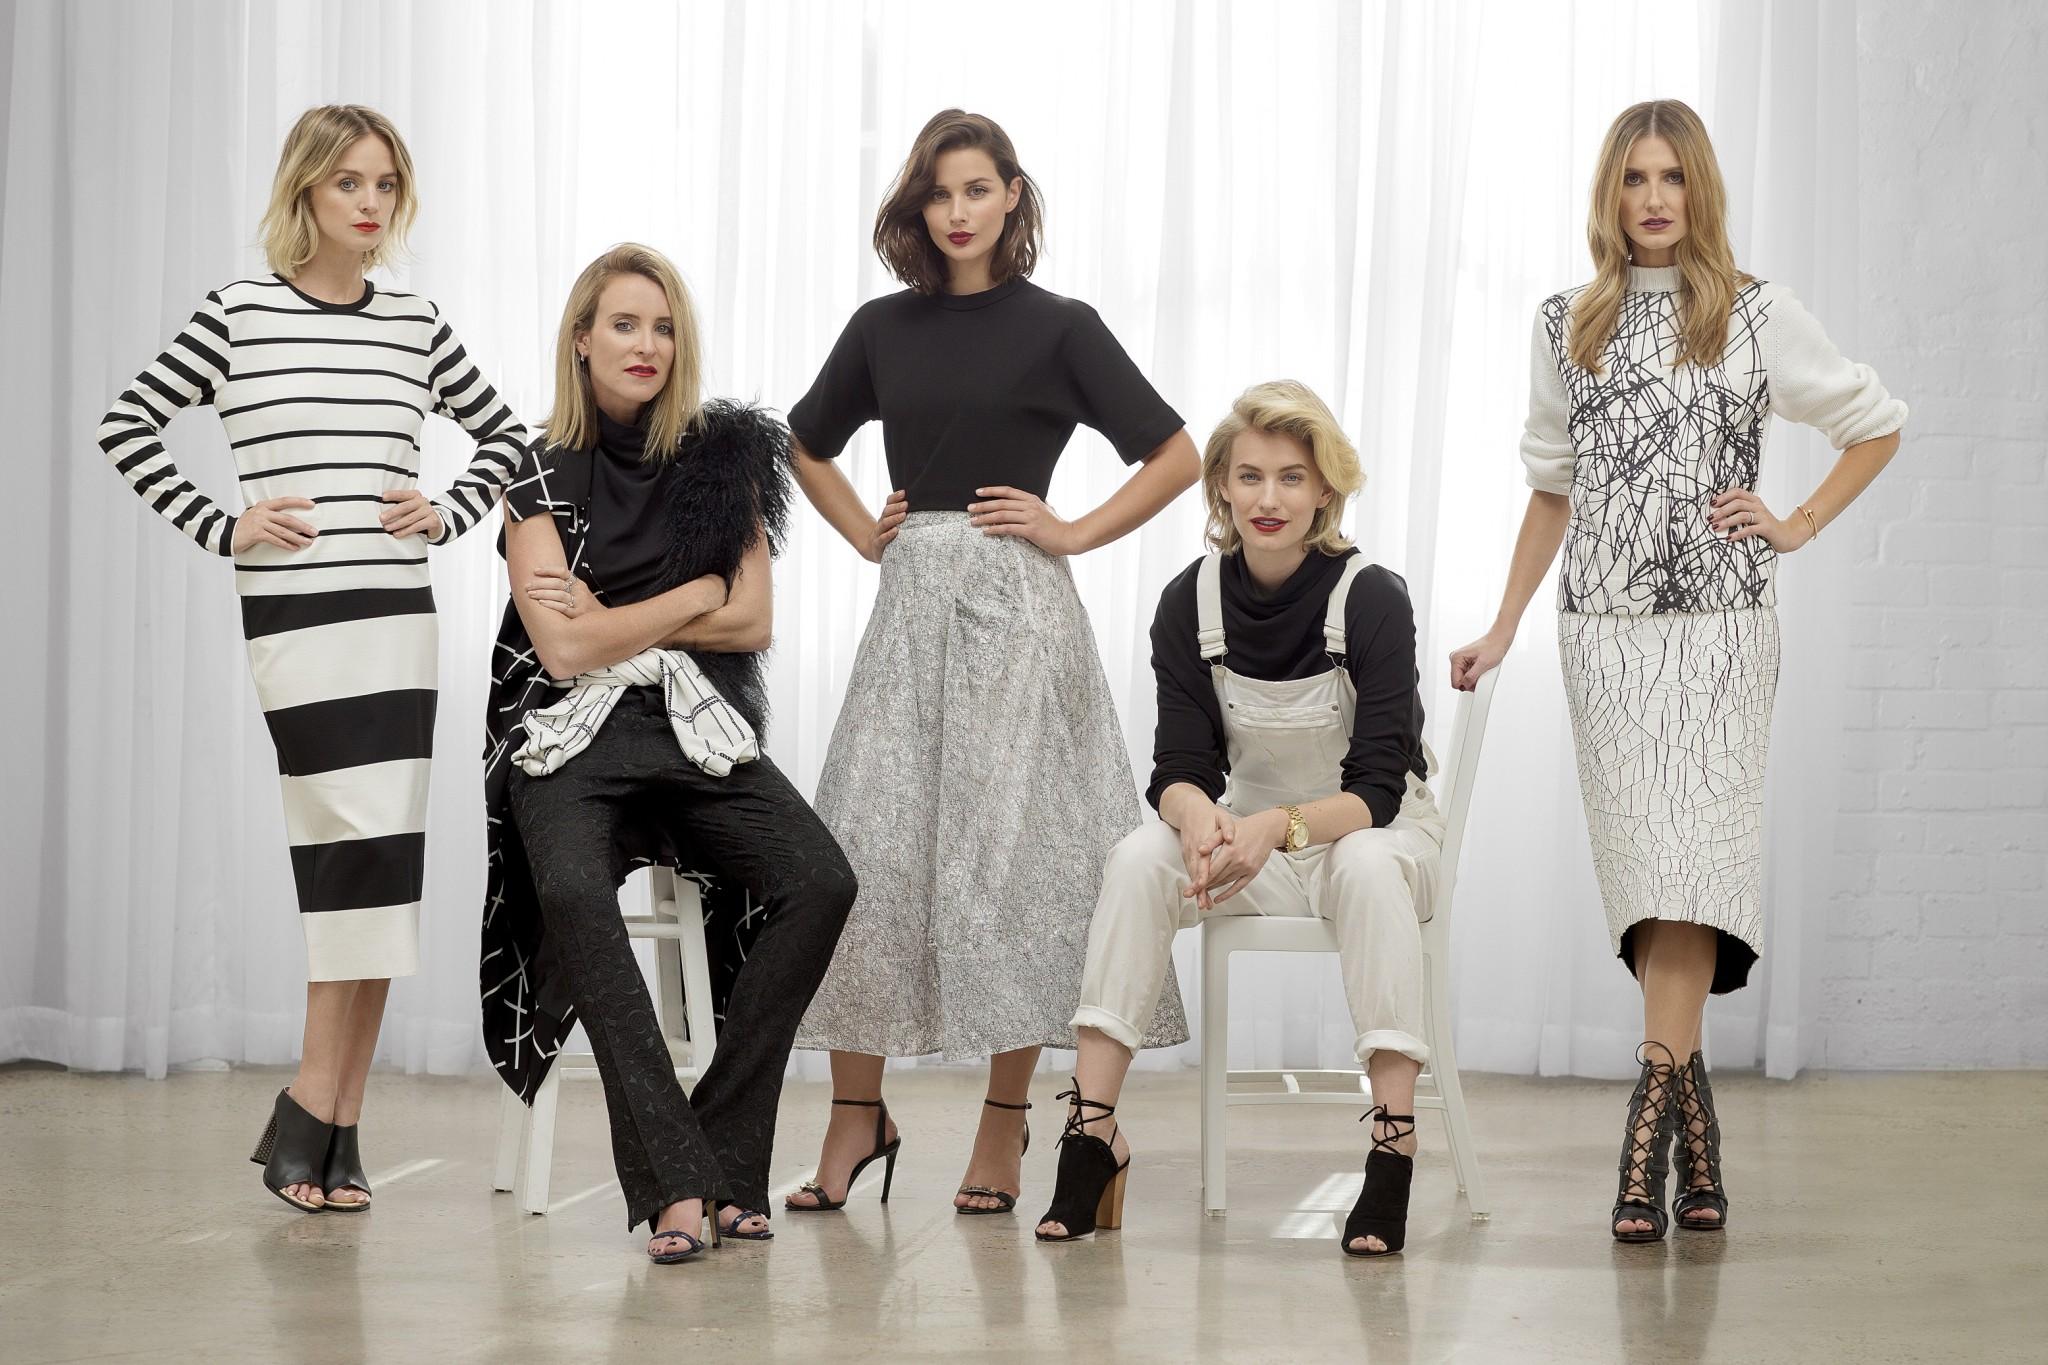 Fashion Picture: FASHION BLOGGERS BACK ON E!